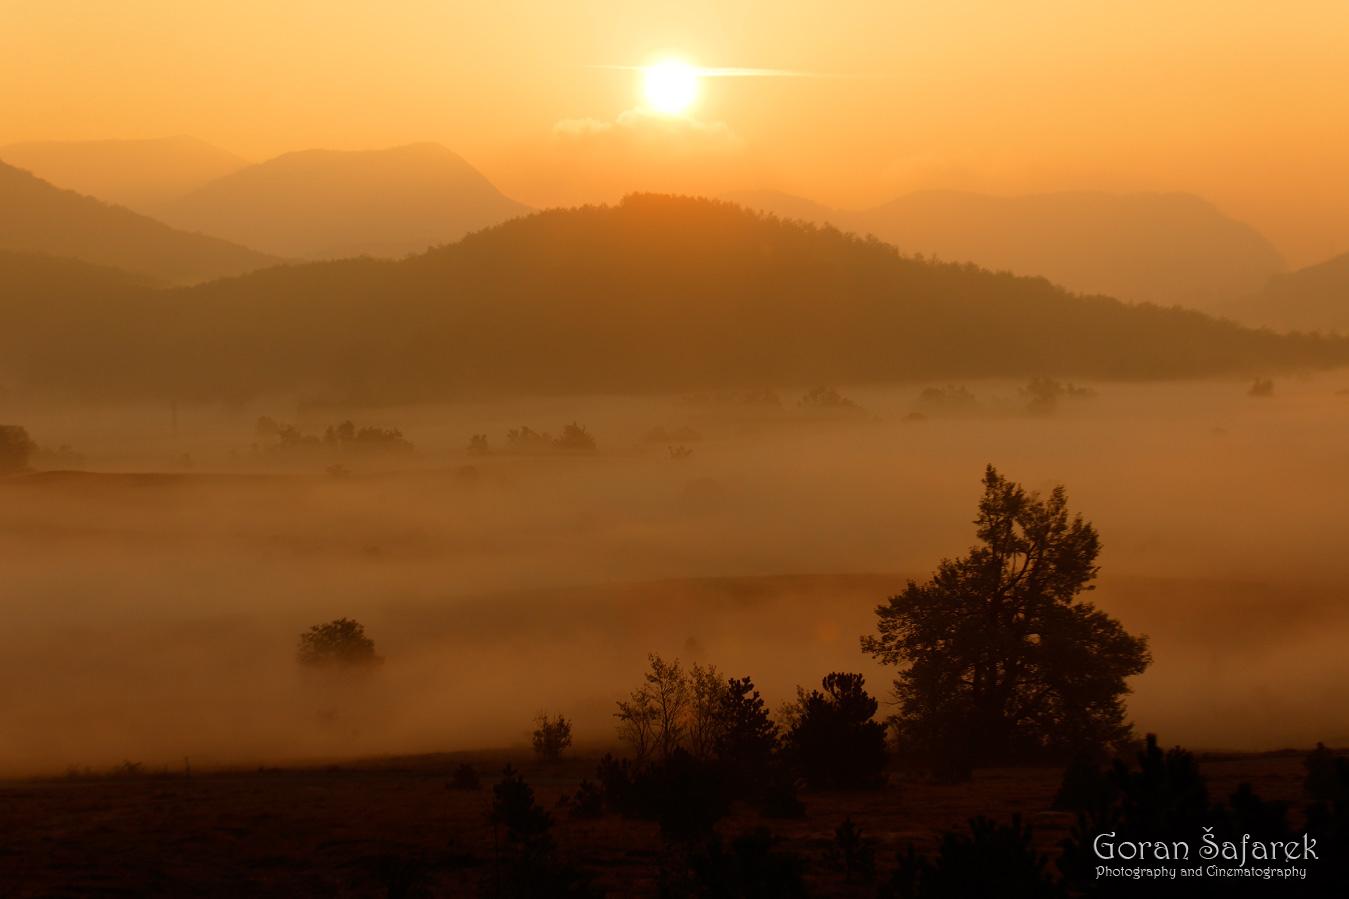 croatia, velebit, lika, mountain, national park, nature park